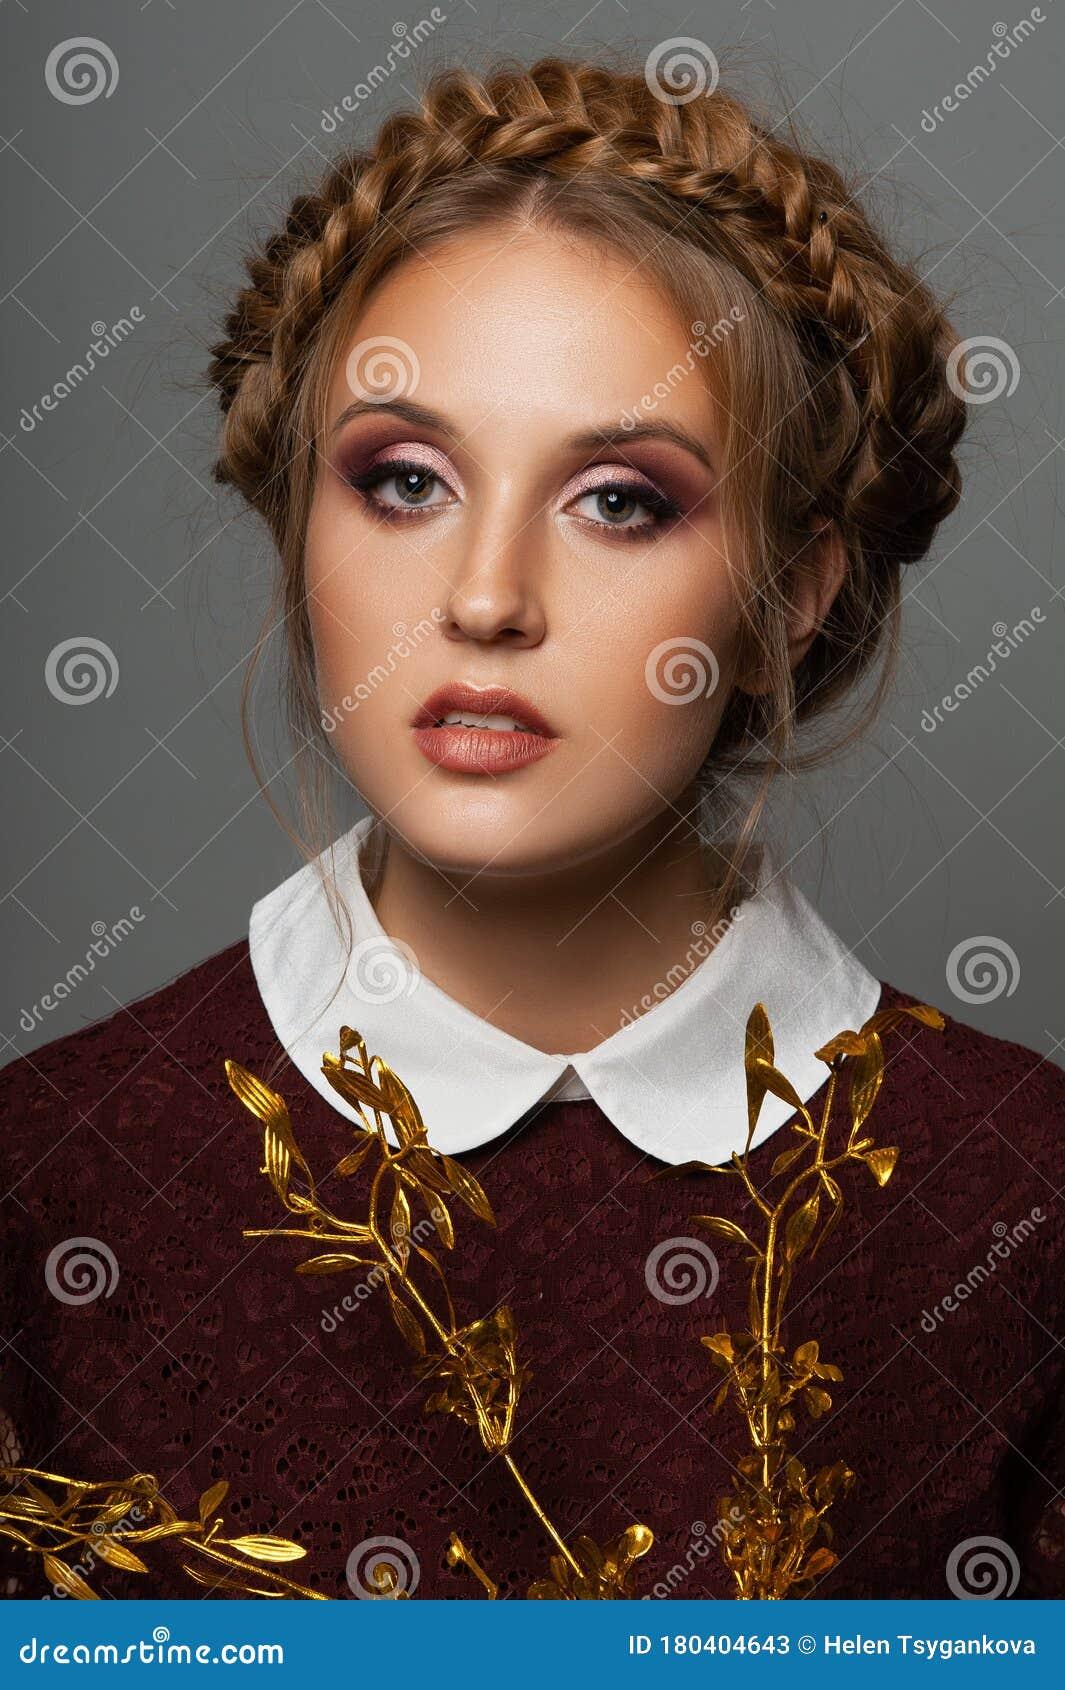 https://thumbs.dreamstime.com/z/beauty-girl-whith-braid-hairstyle-portret-photo-make-up-grey-background-beauty-photo-fashion-photo-russian-beauty-girl-slavic-180404643.jpg